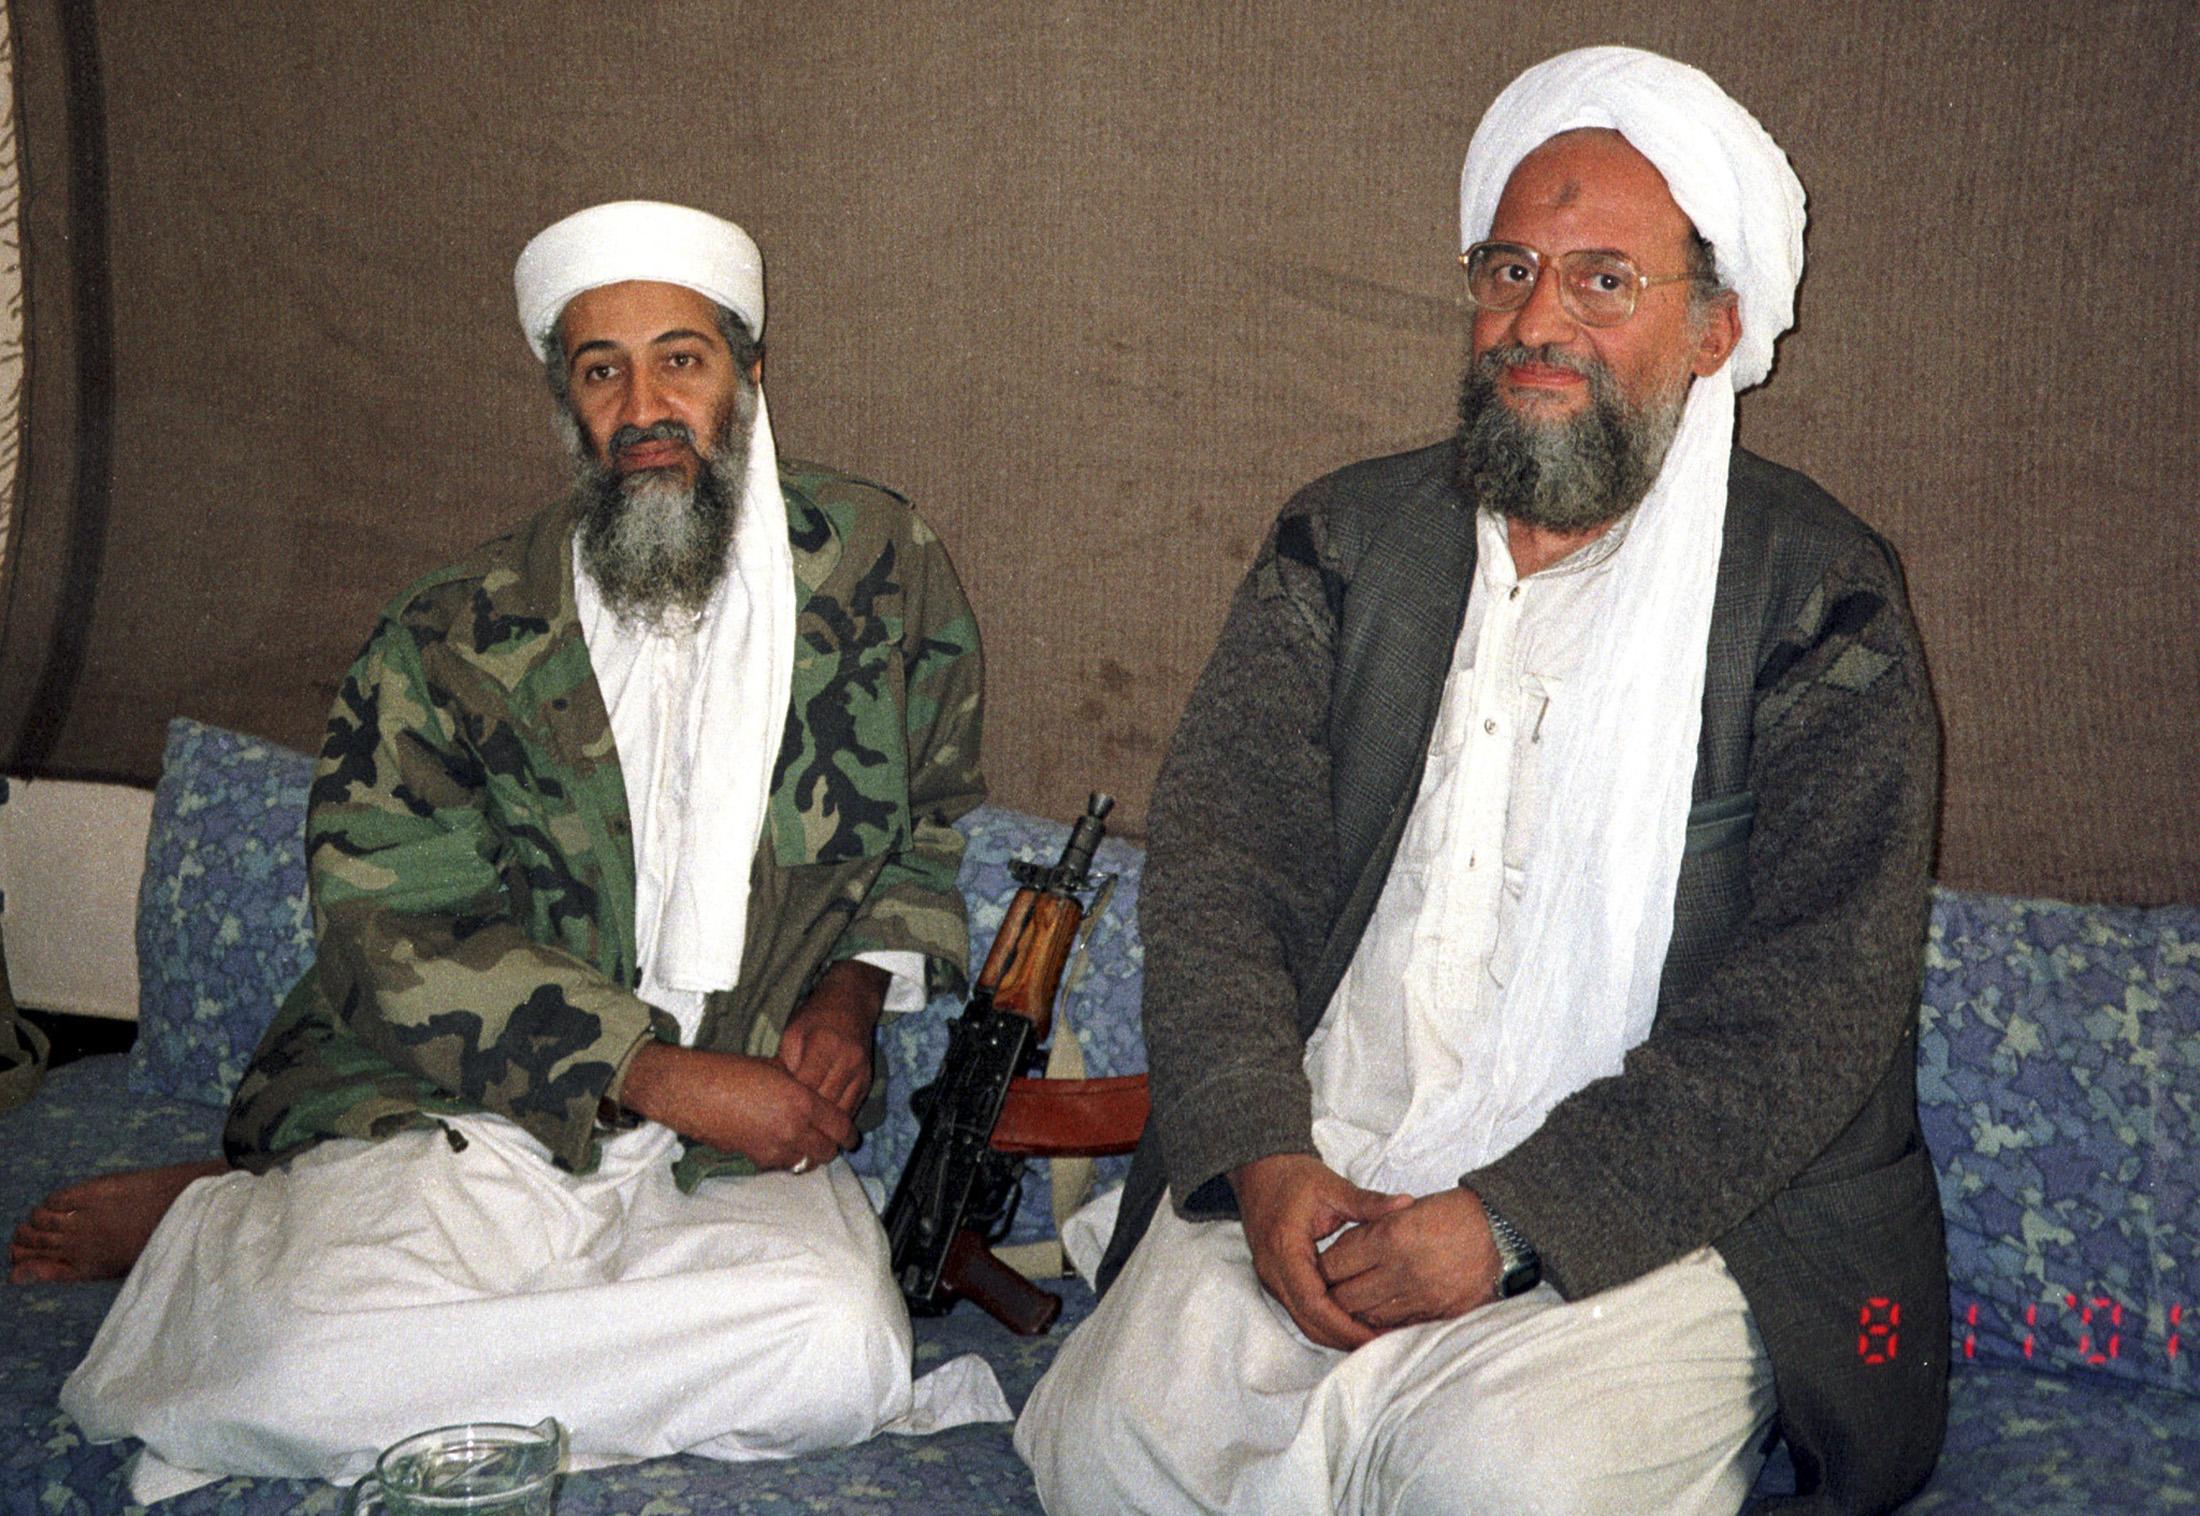 The death of Ayman al-Zawahri and the future of al-Qaida